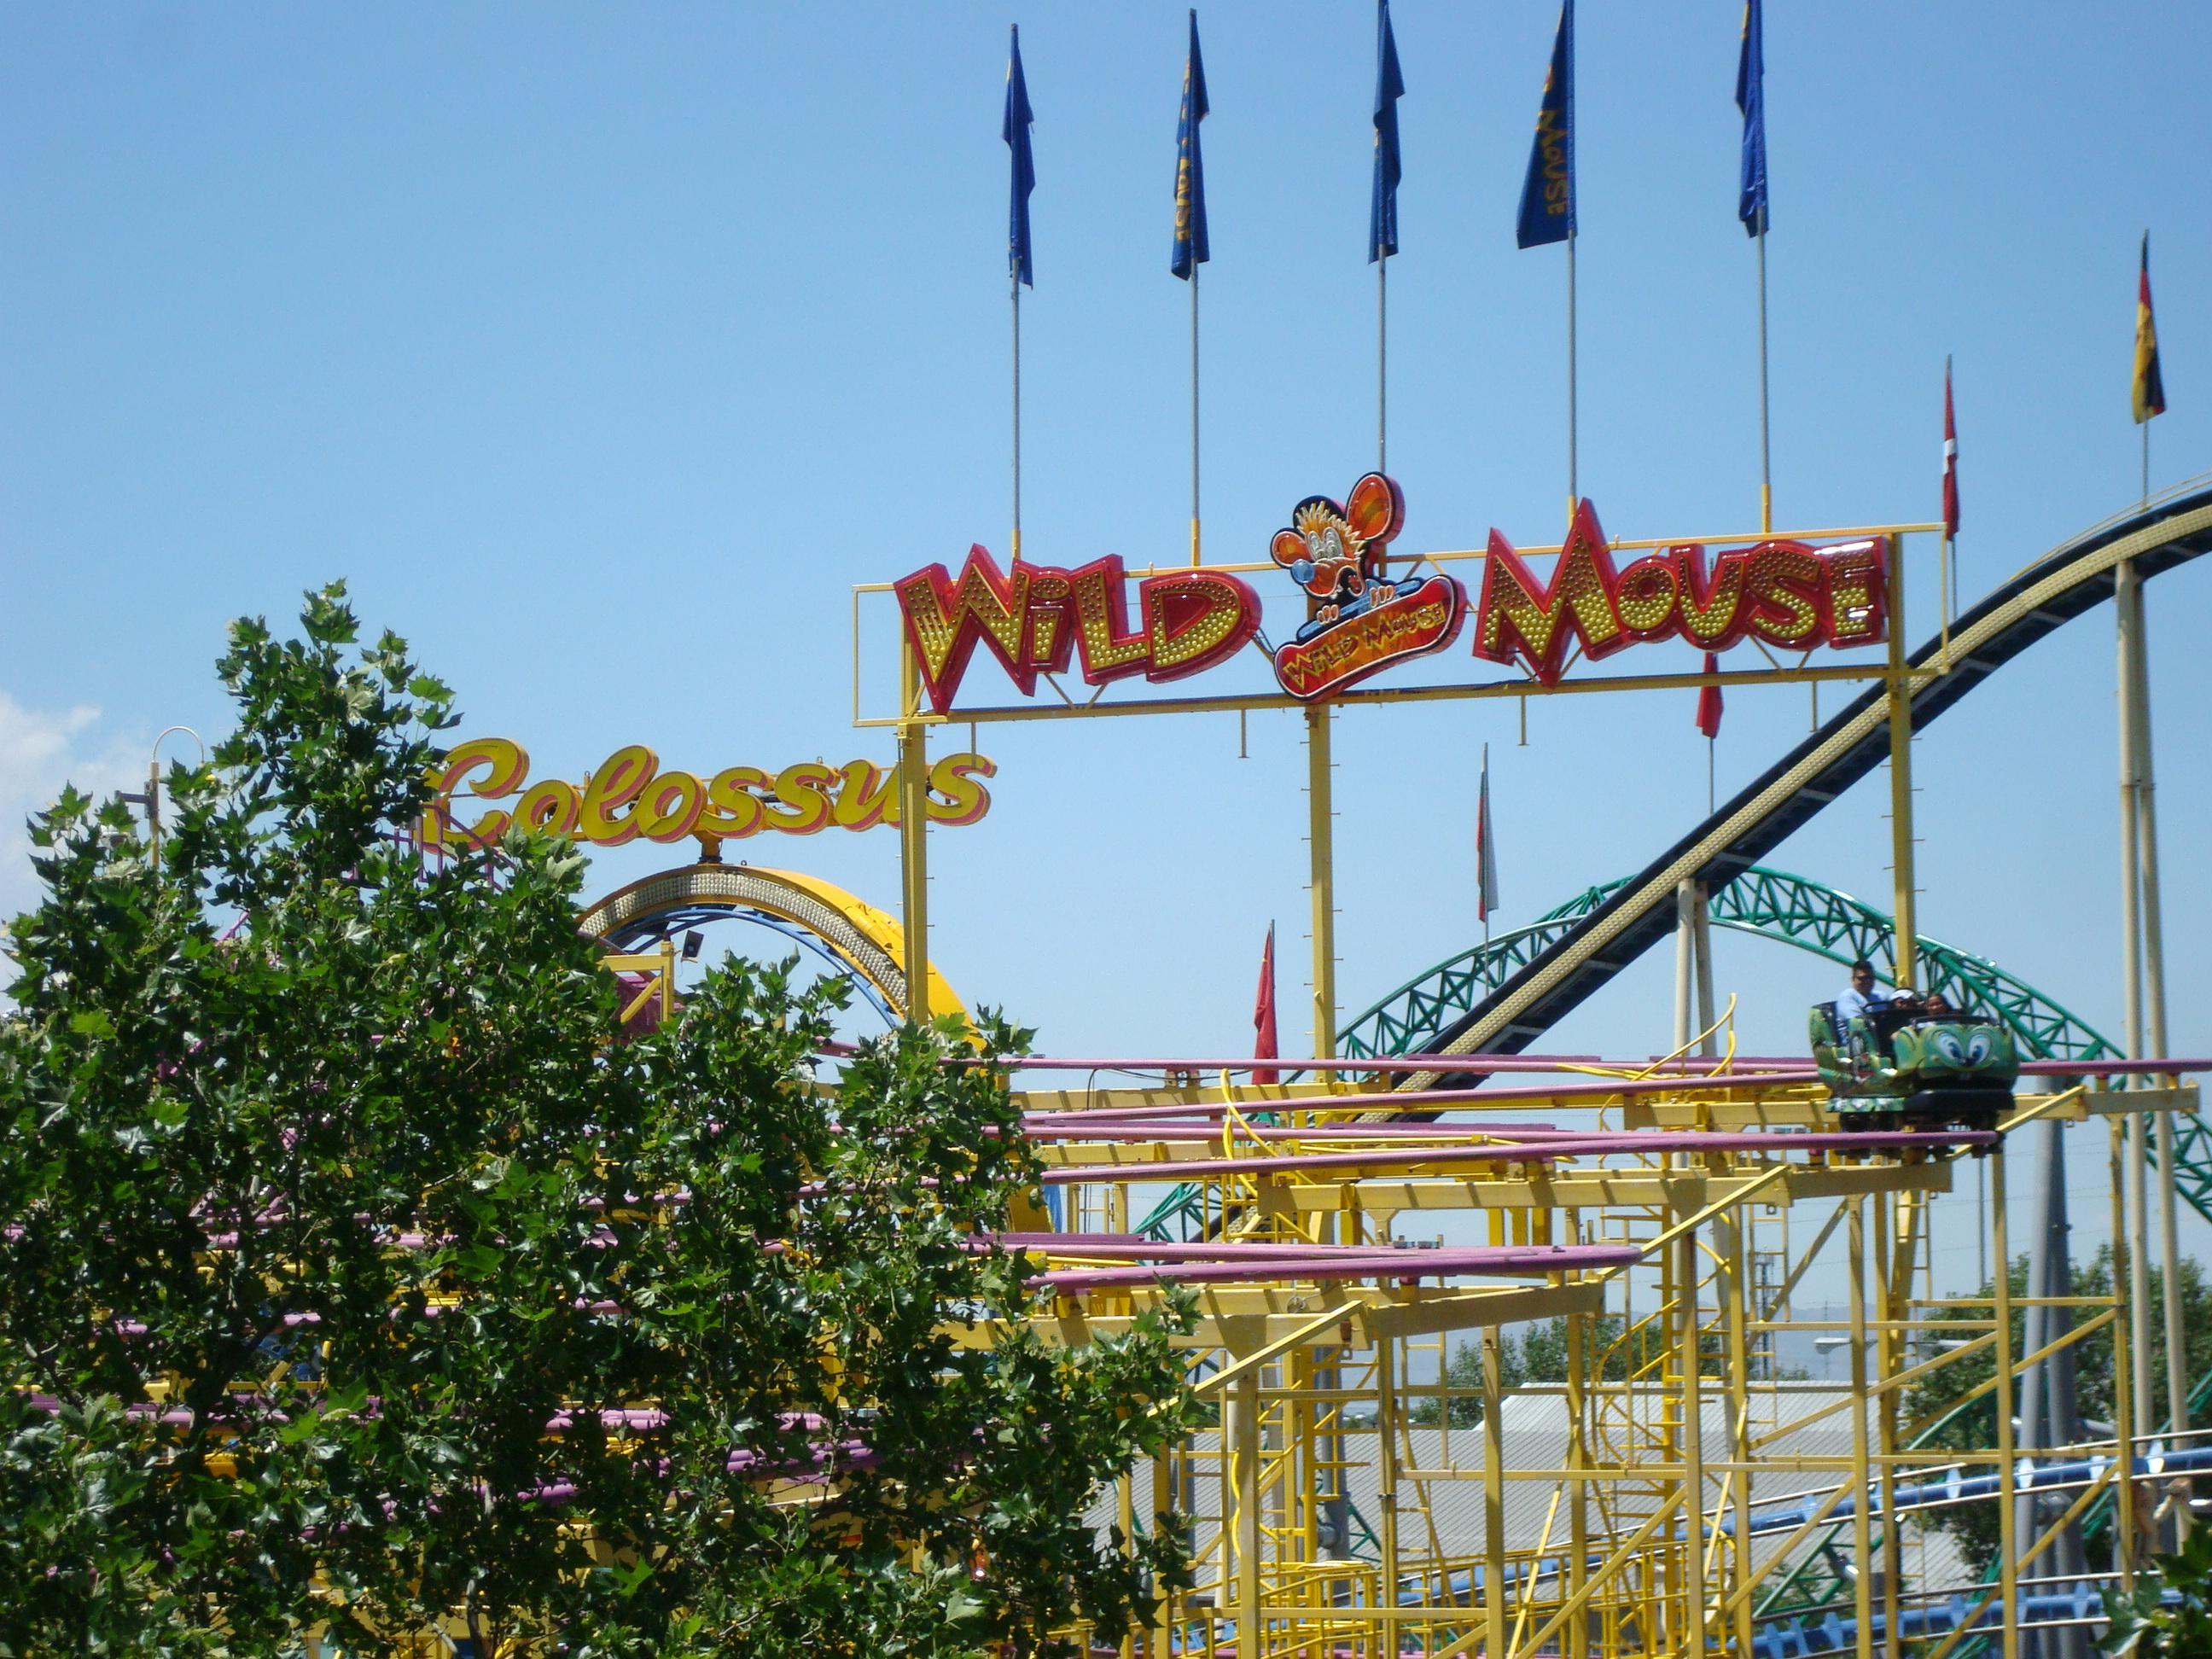 Wild Mouse - Lagoon Amusement Park - Farmington, Utah Image